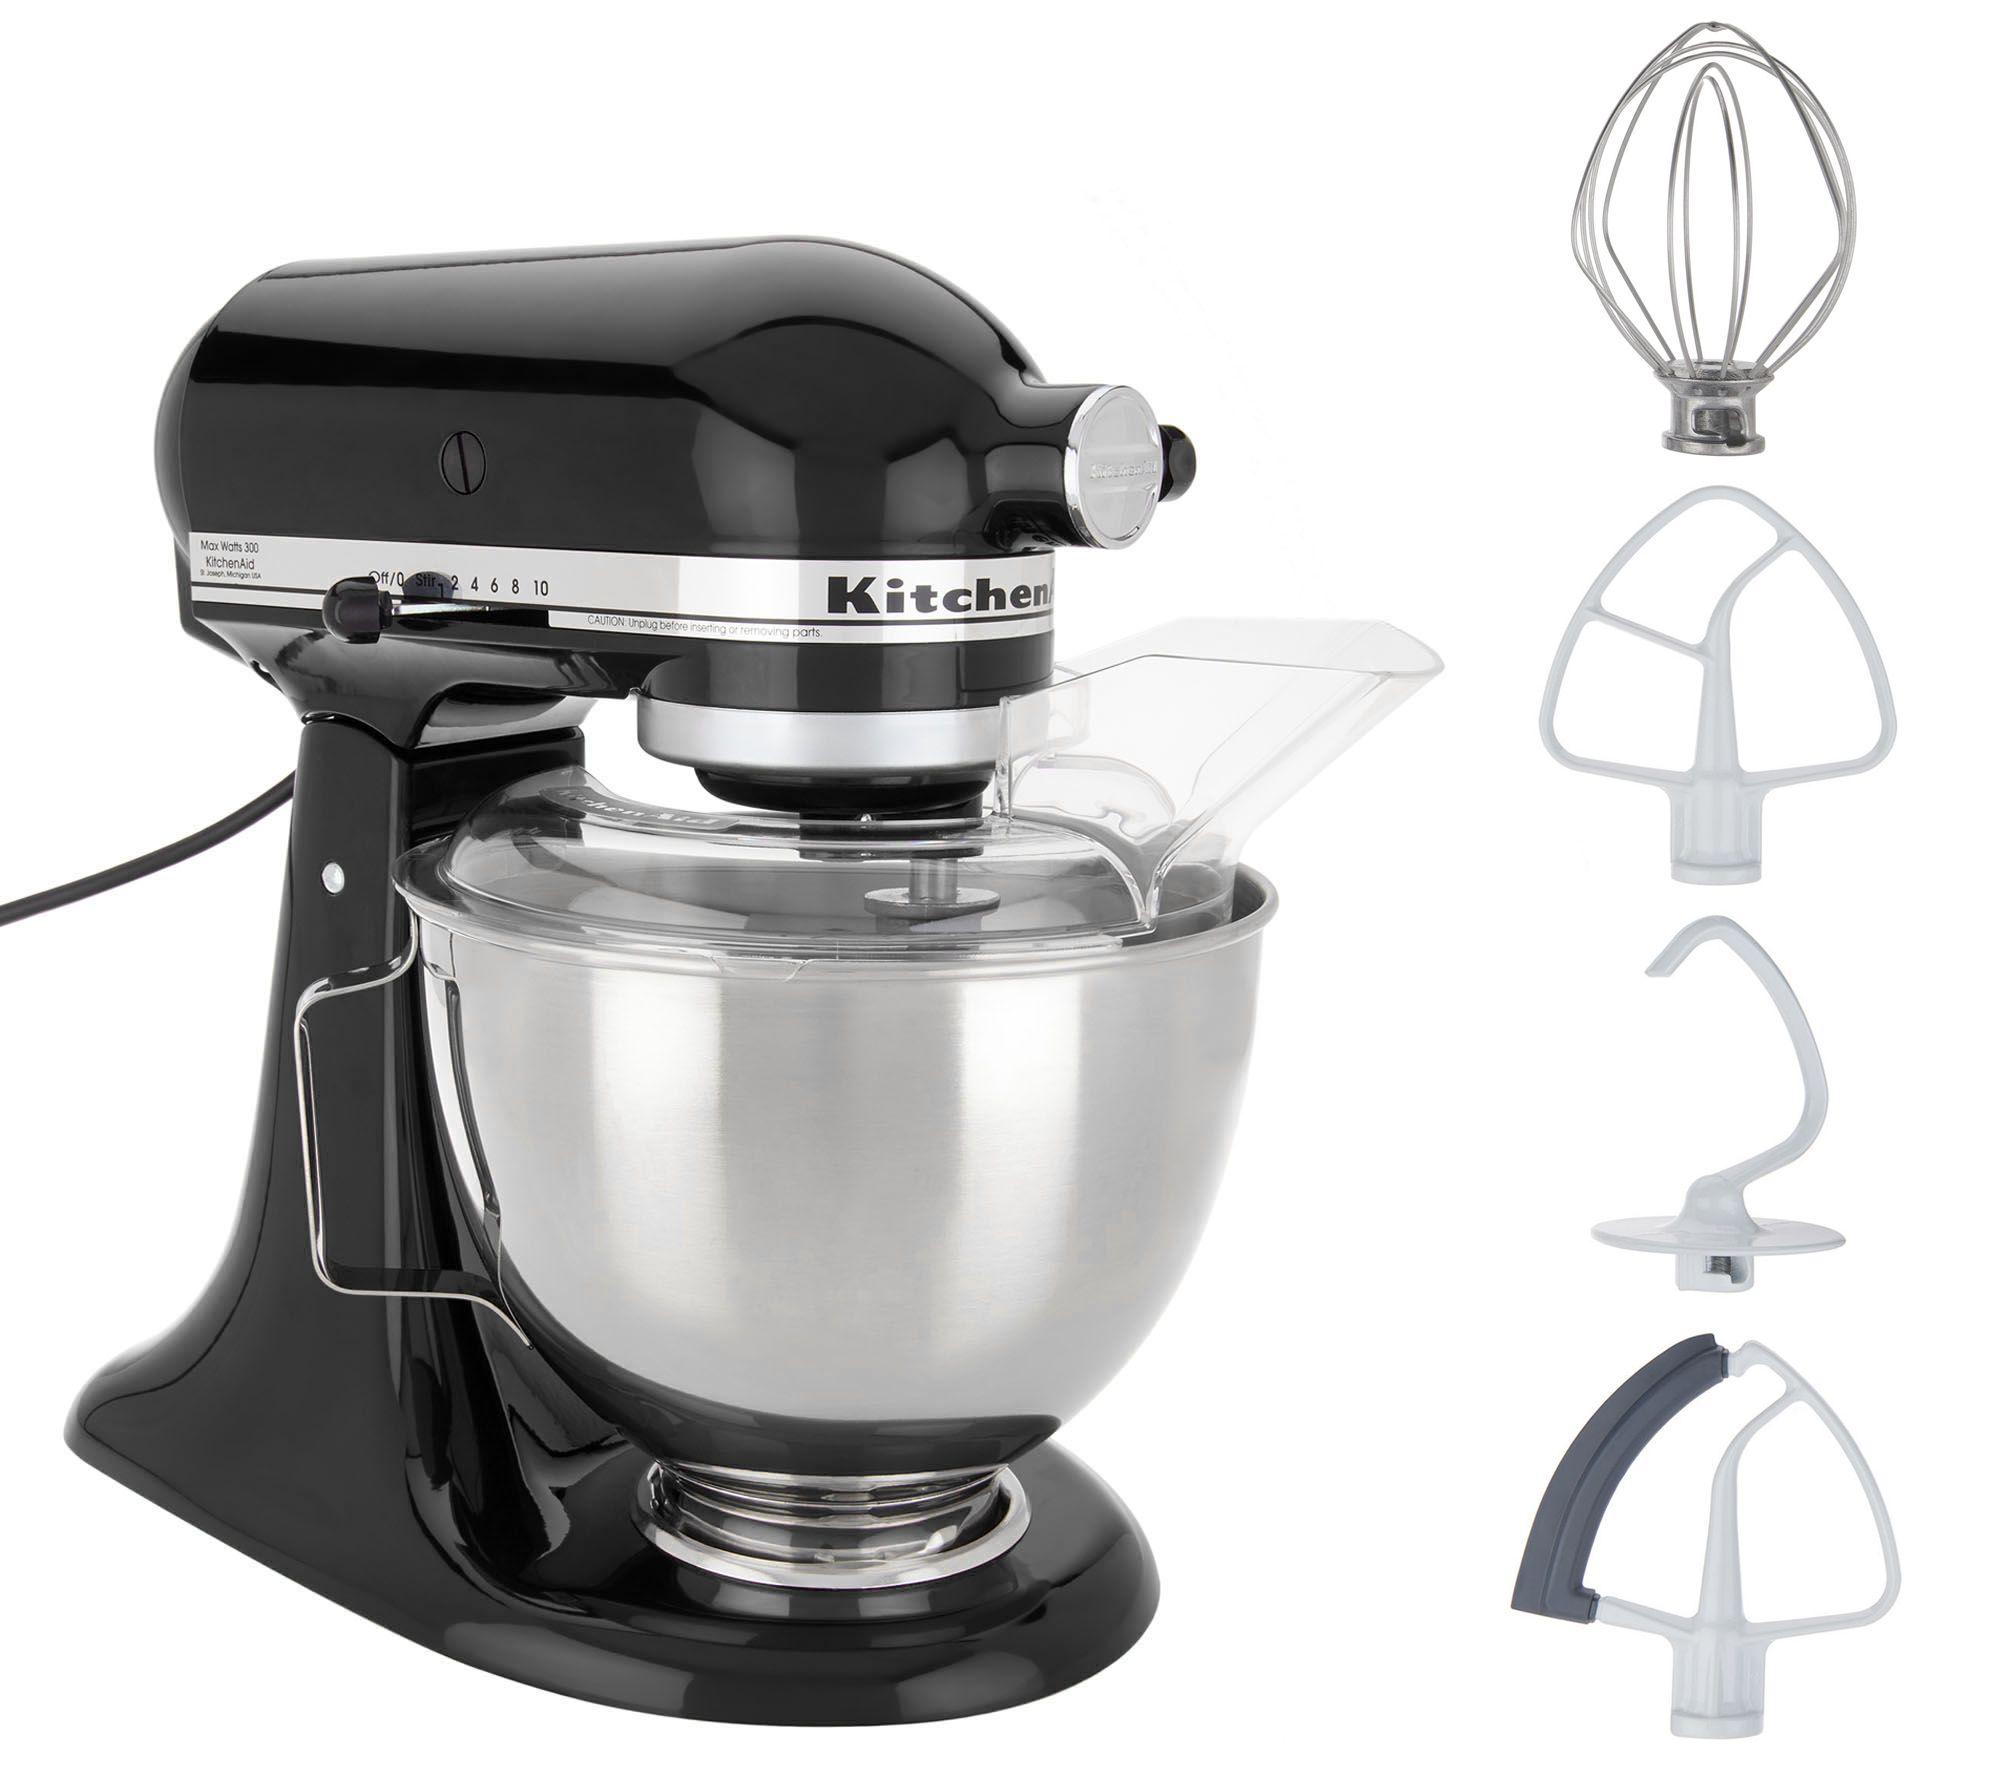 KitchenAid 4.5-qt 300W Tilt-Head Stand Mixer with Flex Edge — QVC.com